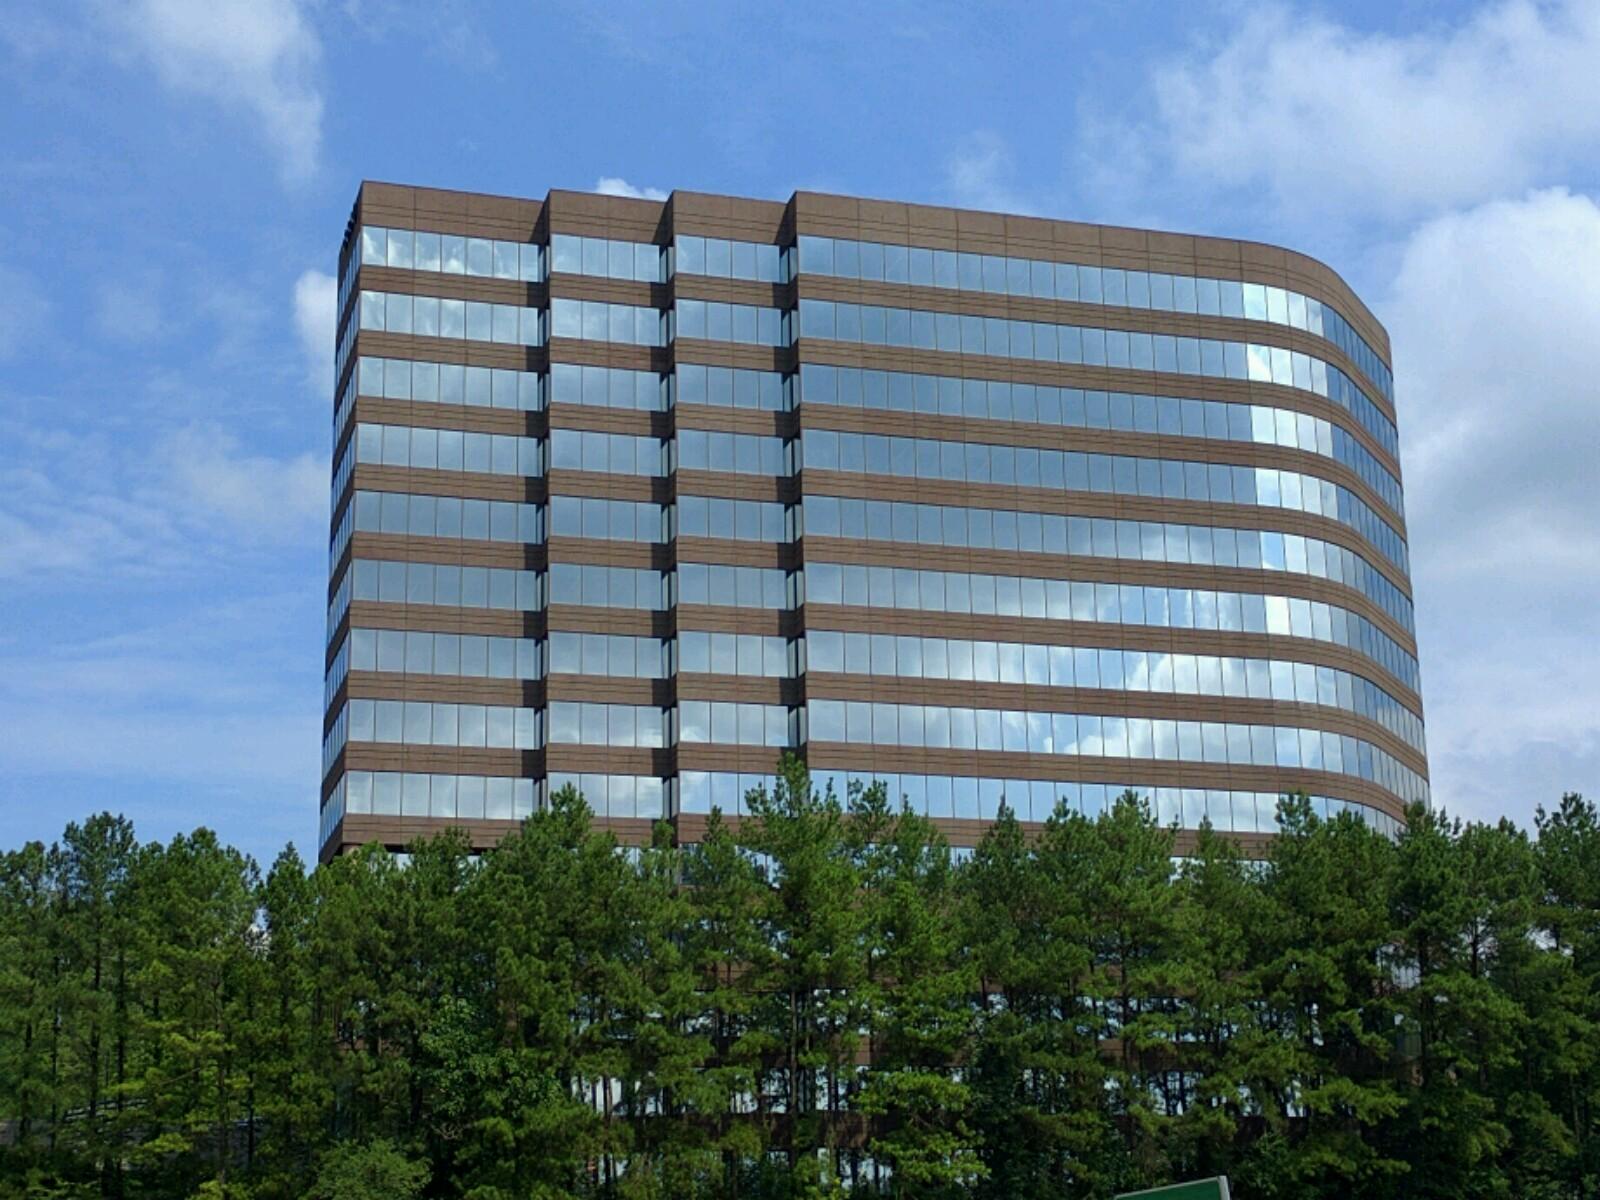 View of Intercontinental Exchange's corporate headquarters in Atlanta, Georgia.